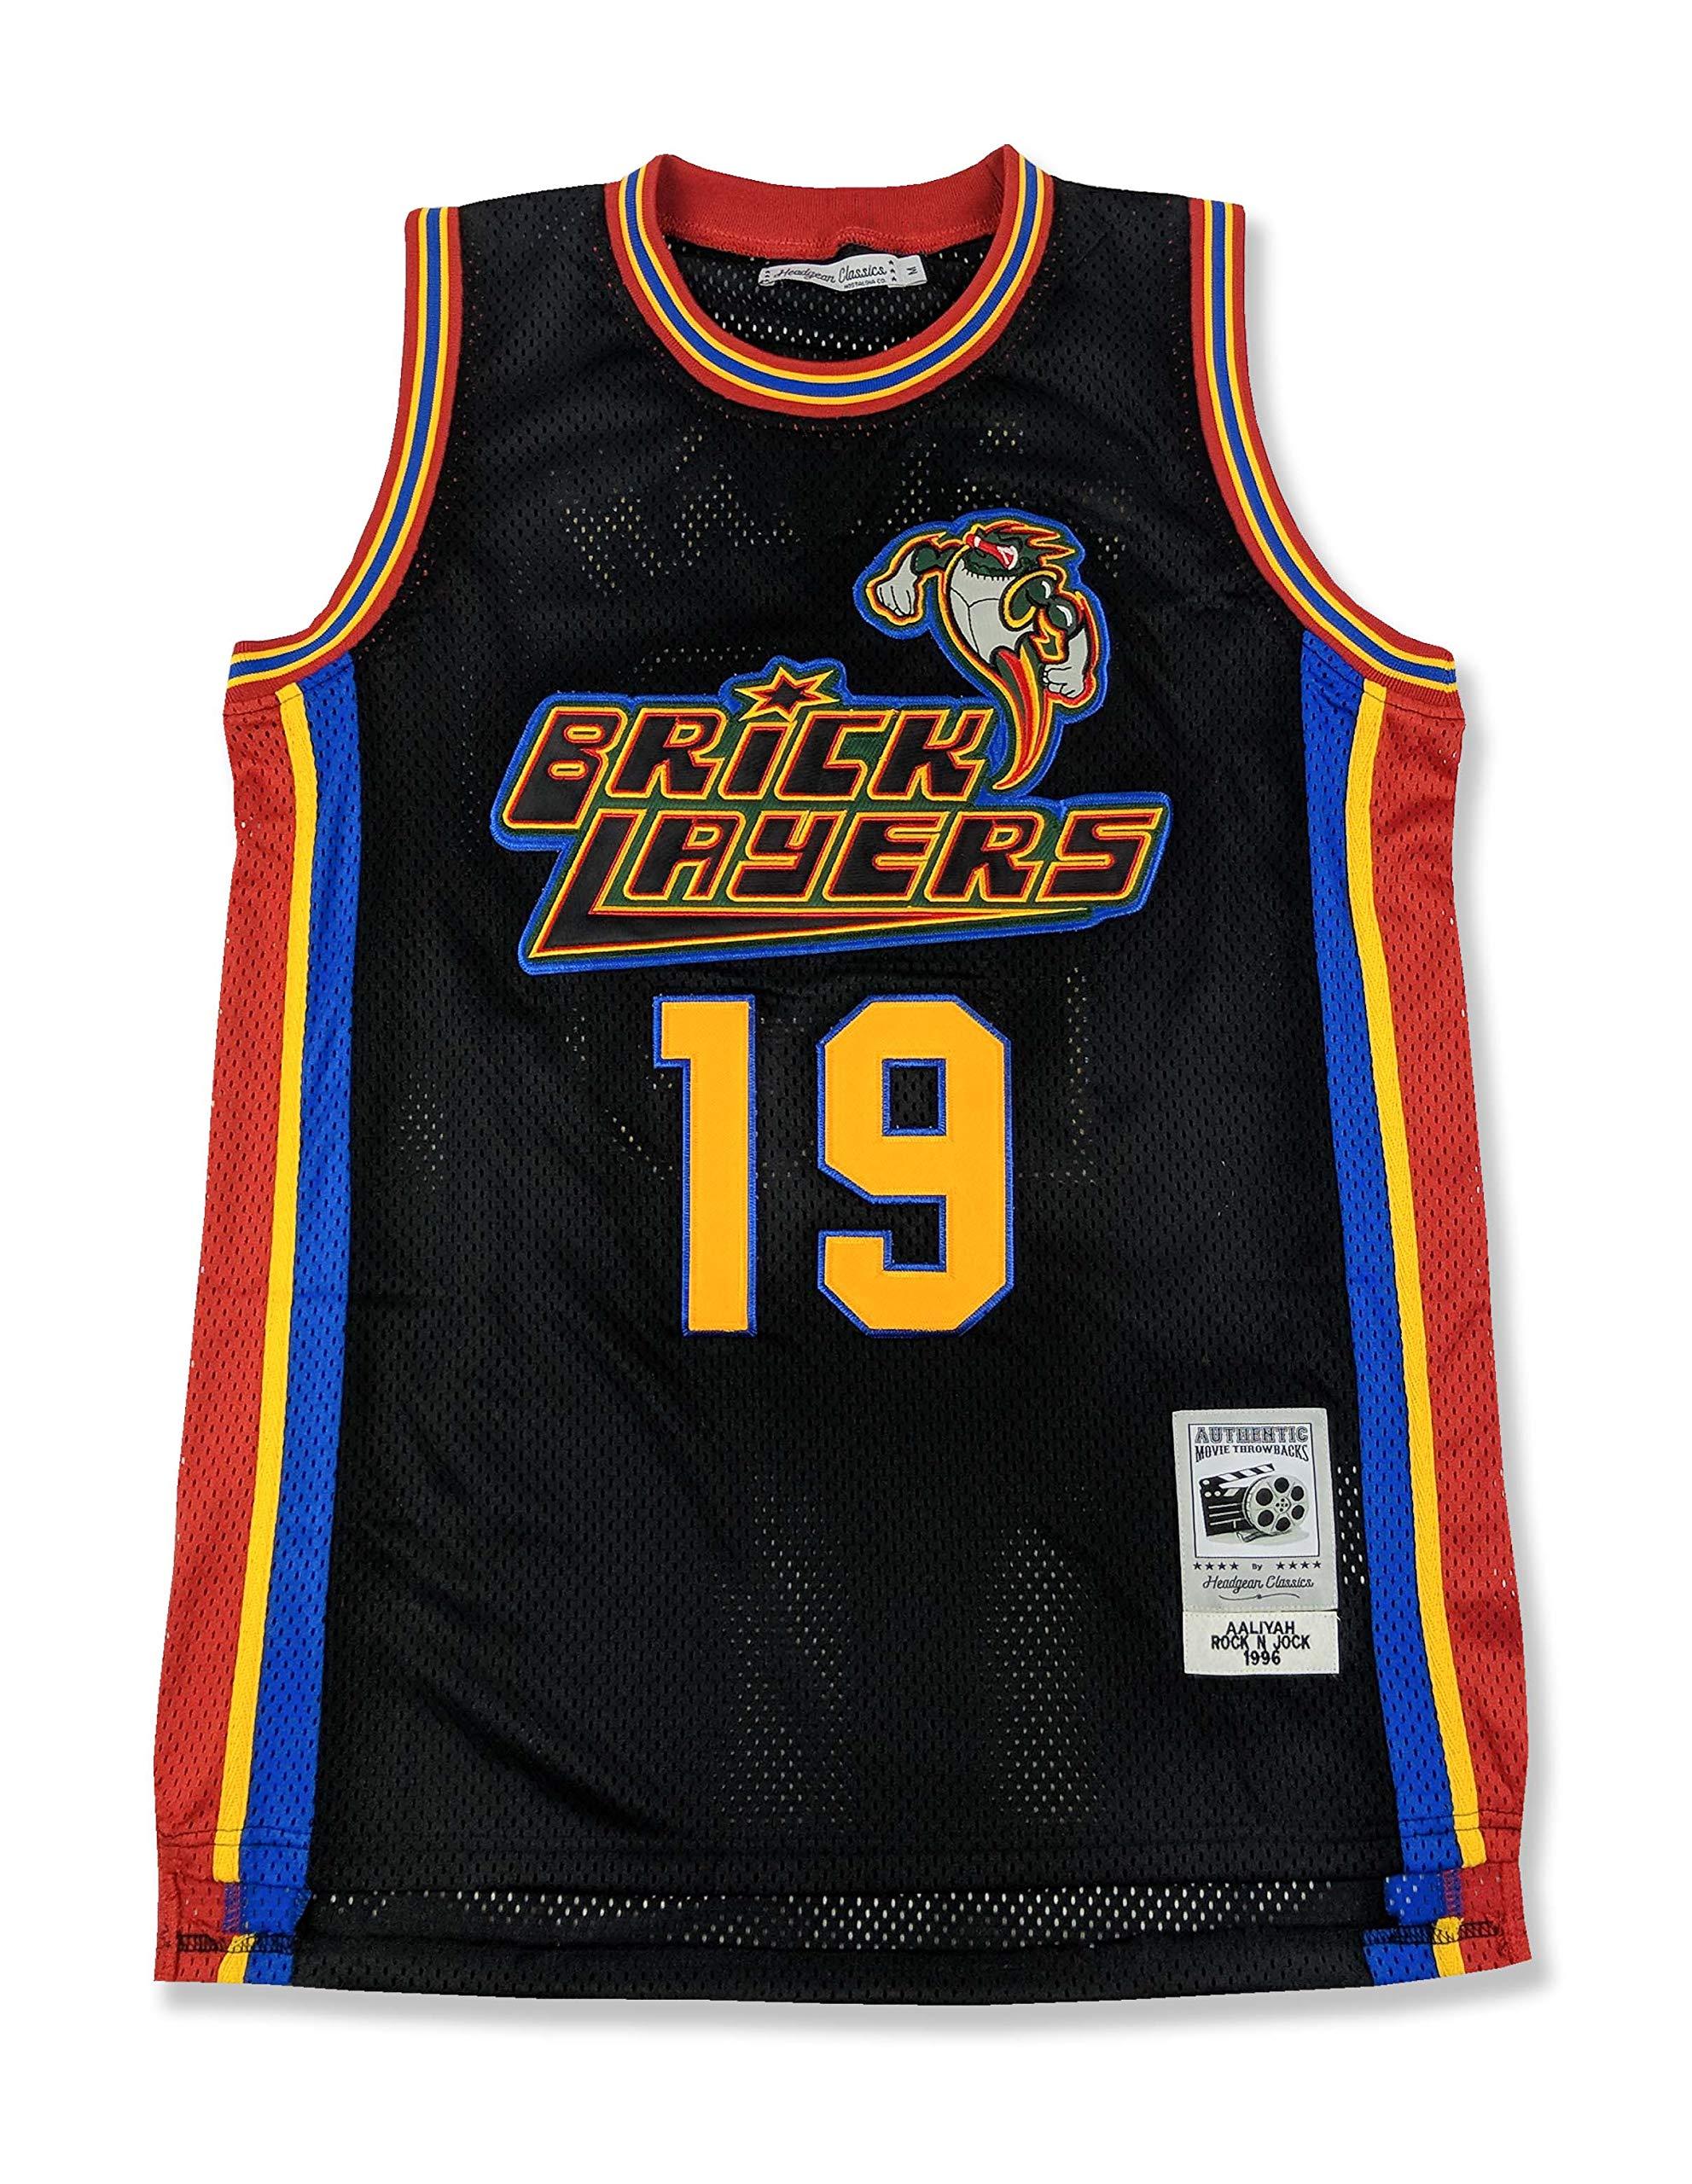 651857930bb HeadGear Rock N Jock Aaliyah Basketball Jersey